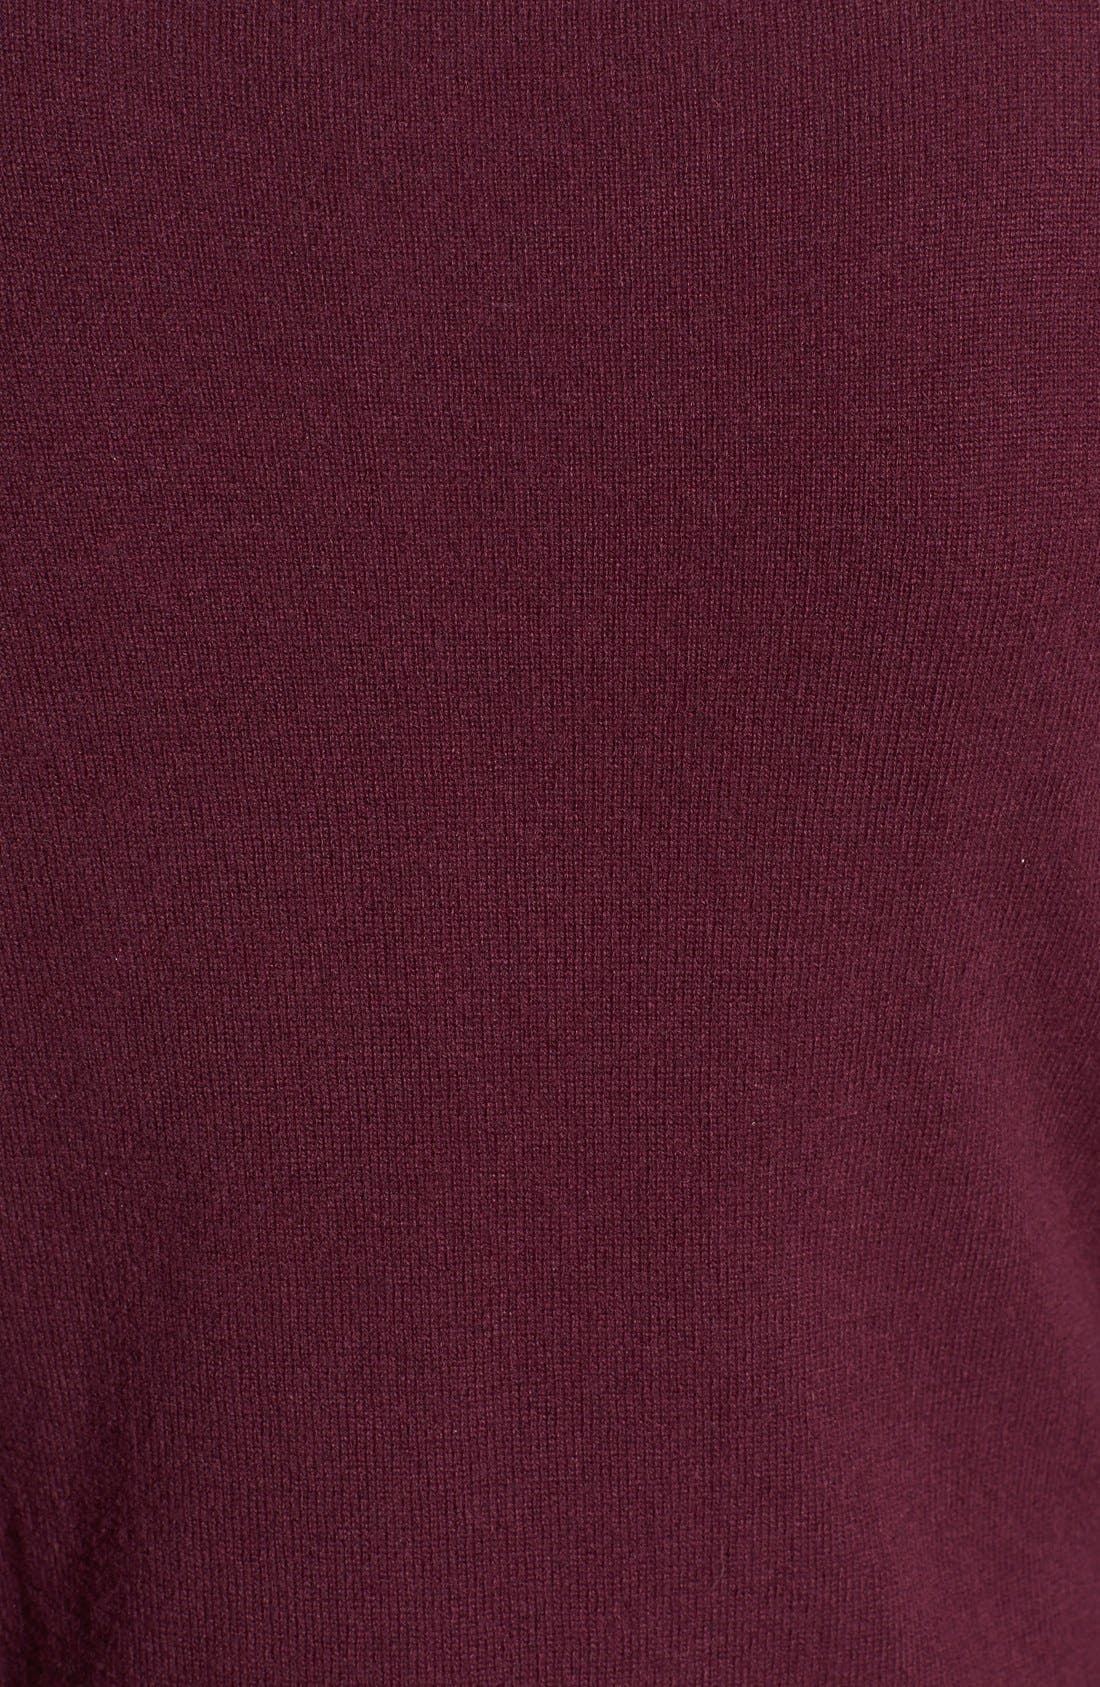 Alternate Image 3  - Nordstrom Collection Ballet Neck Cashmere Sweater